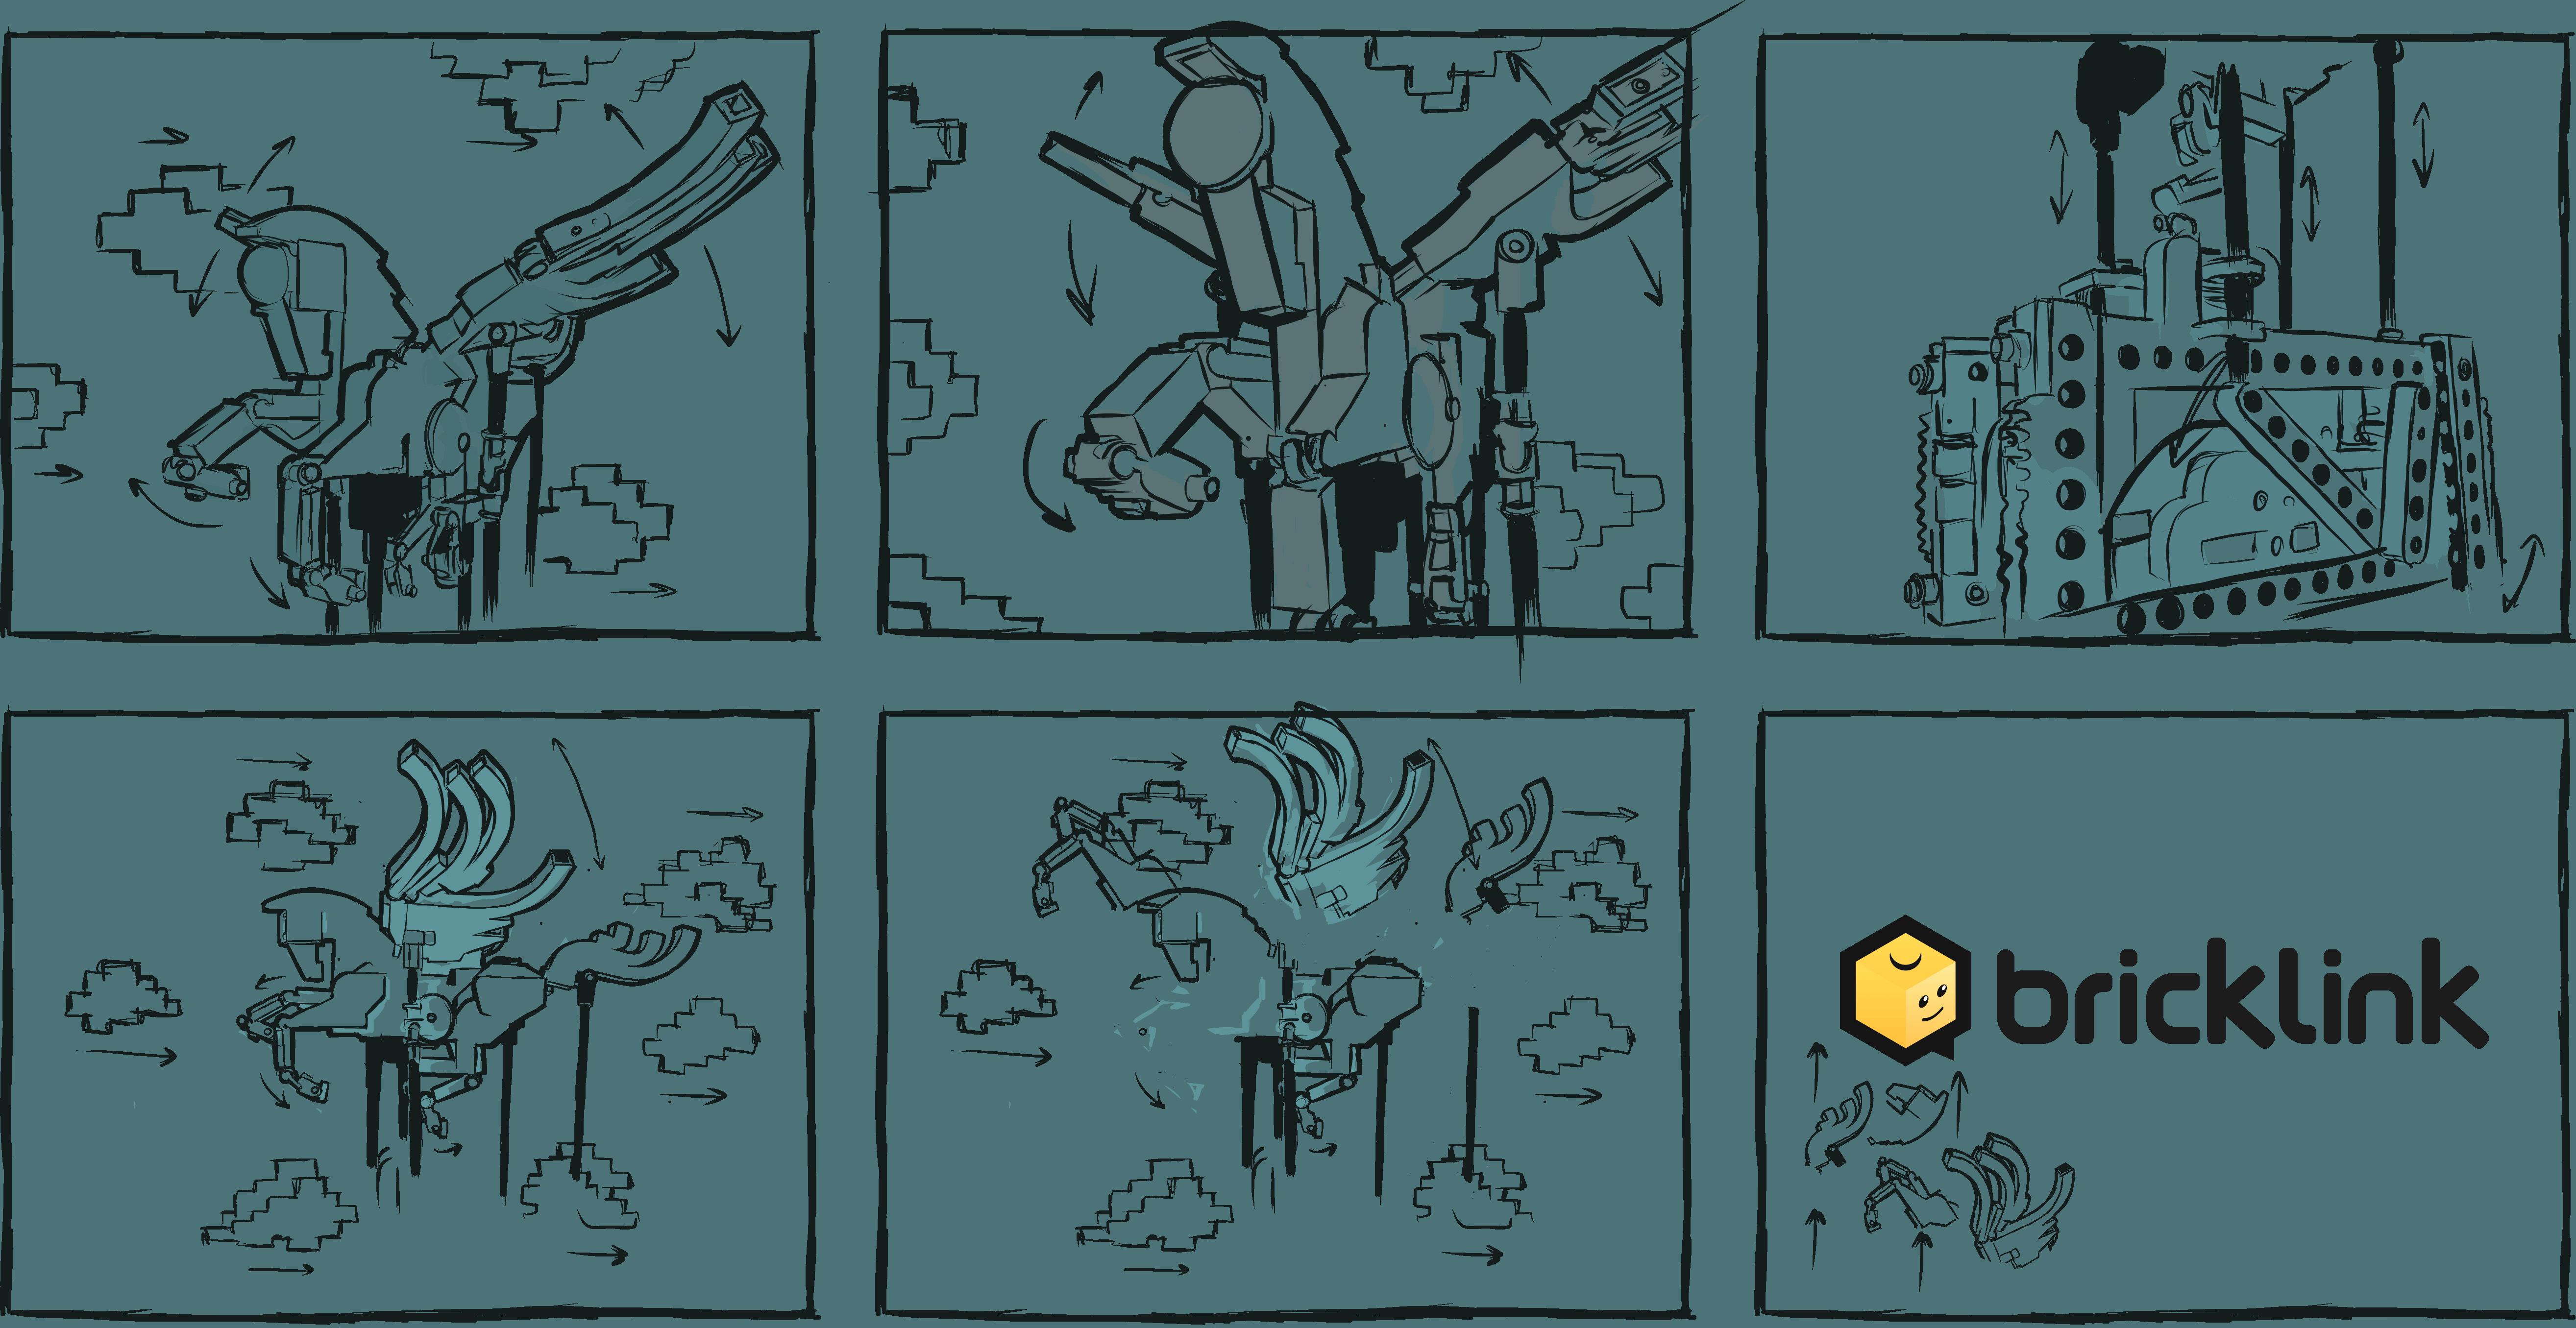 BrickLink Storyboards